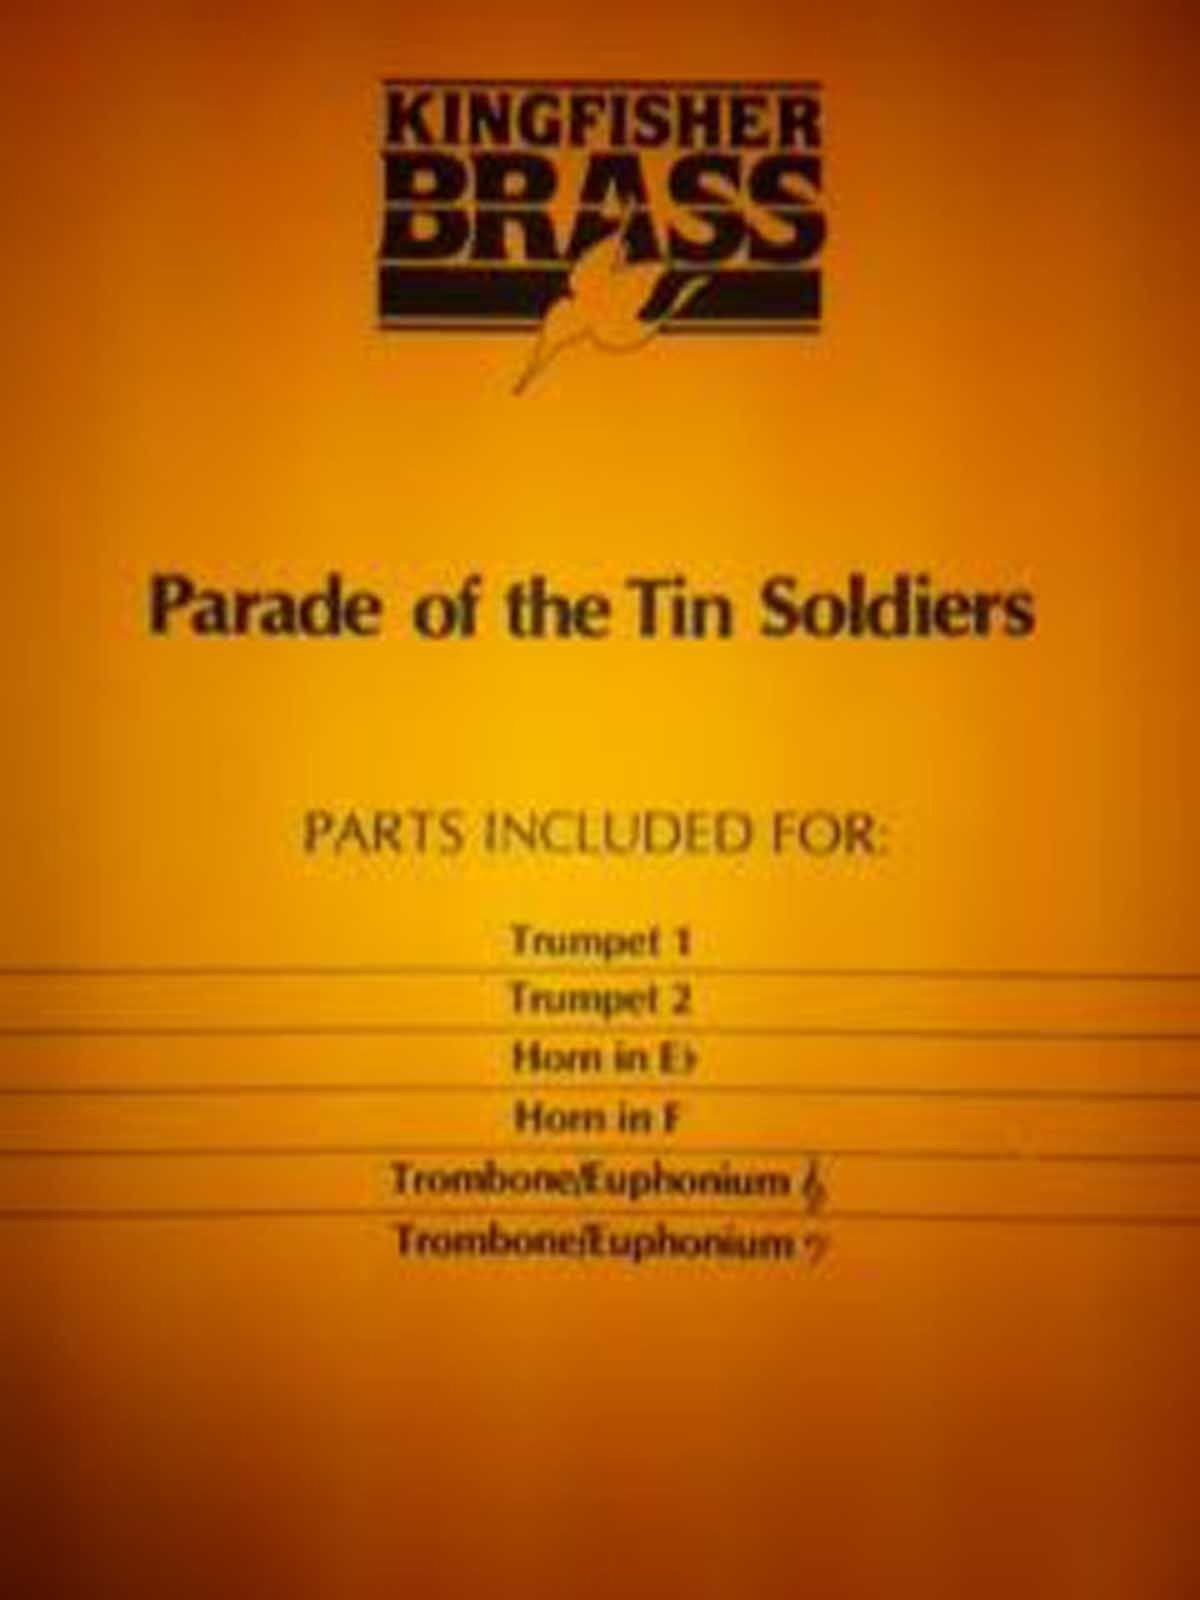 Parade of the Tin Soldiers Brass Quartet Intermediate Sheet Music Arr Hague S145